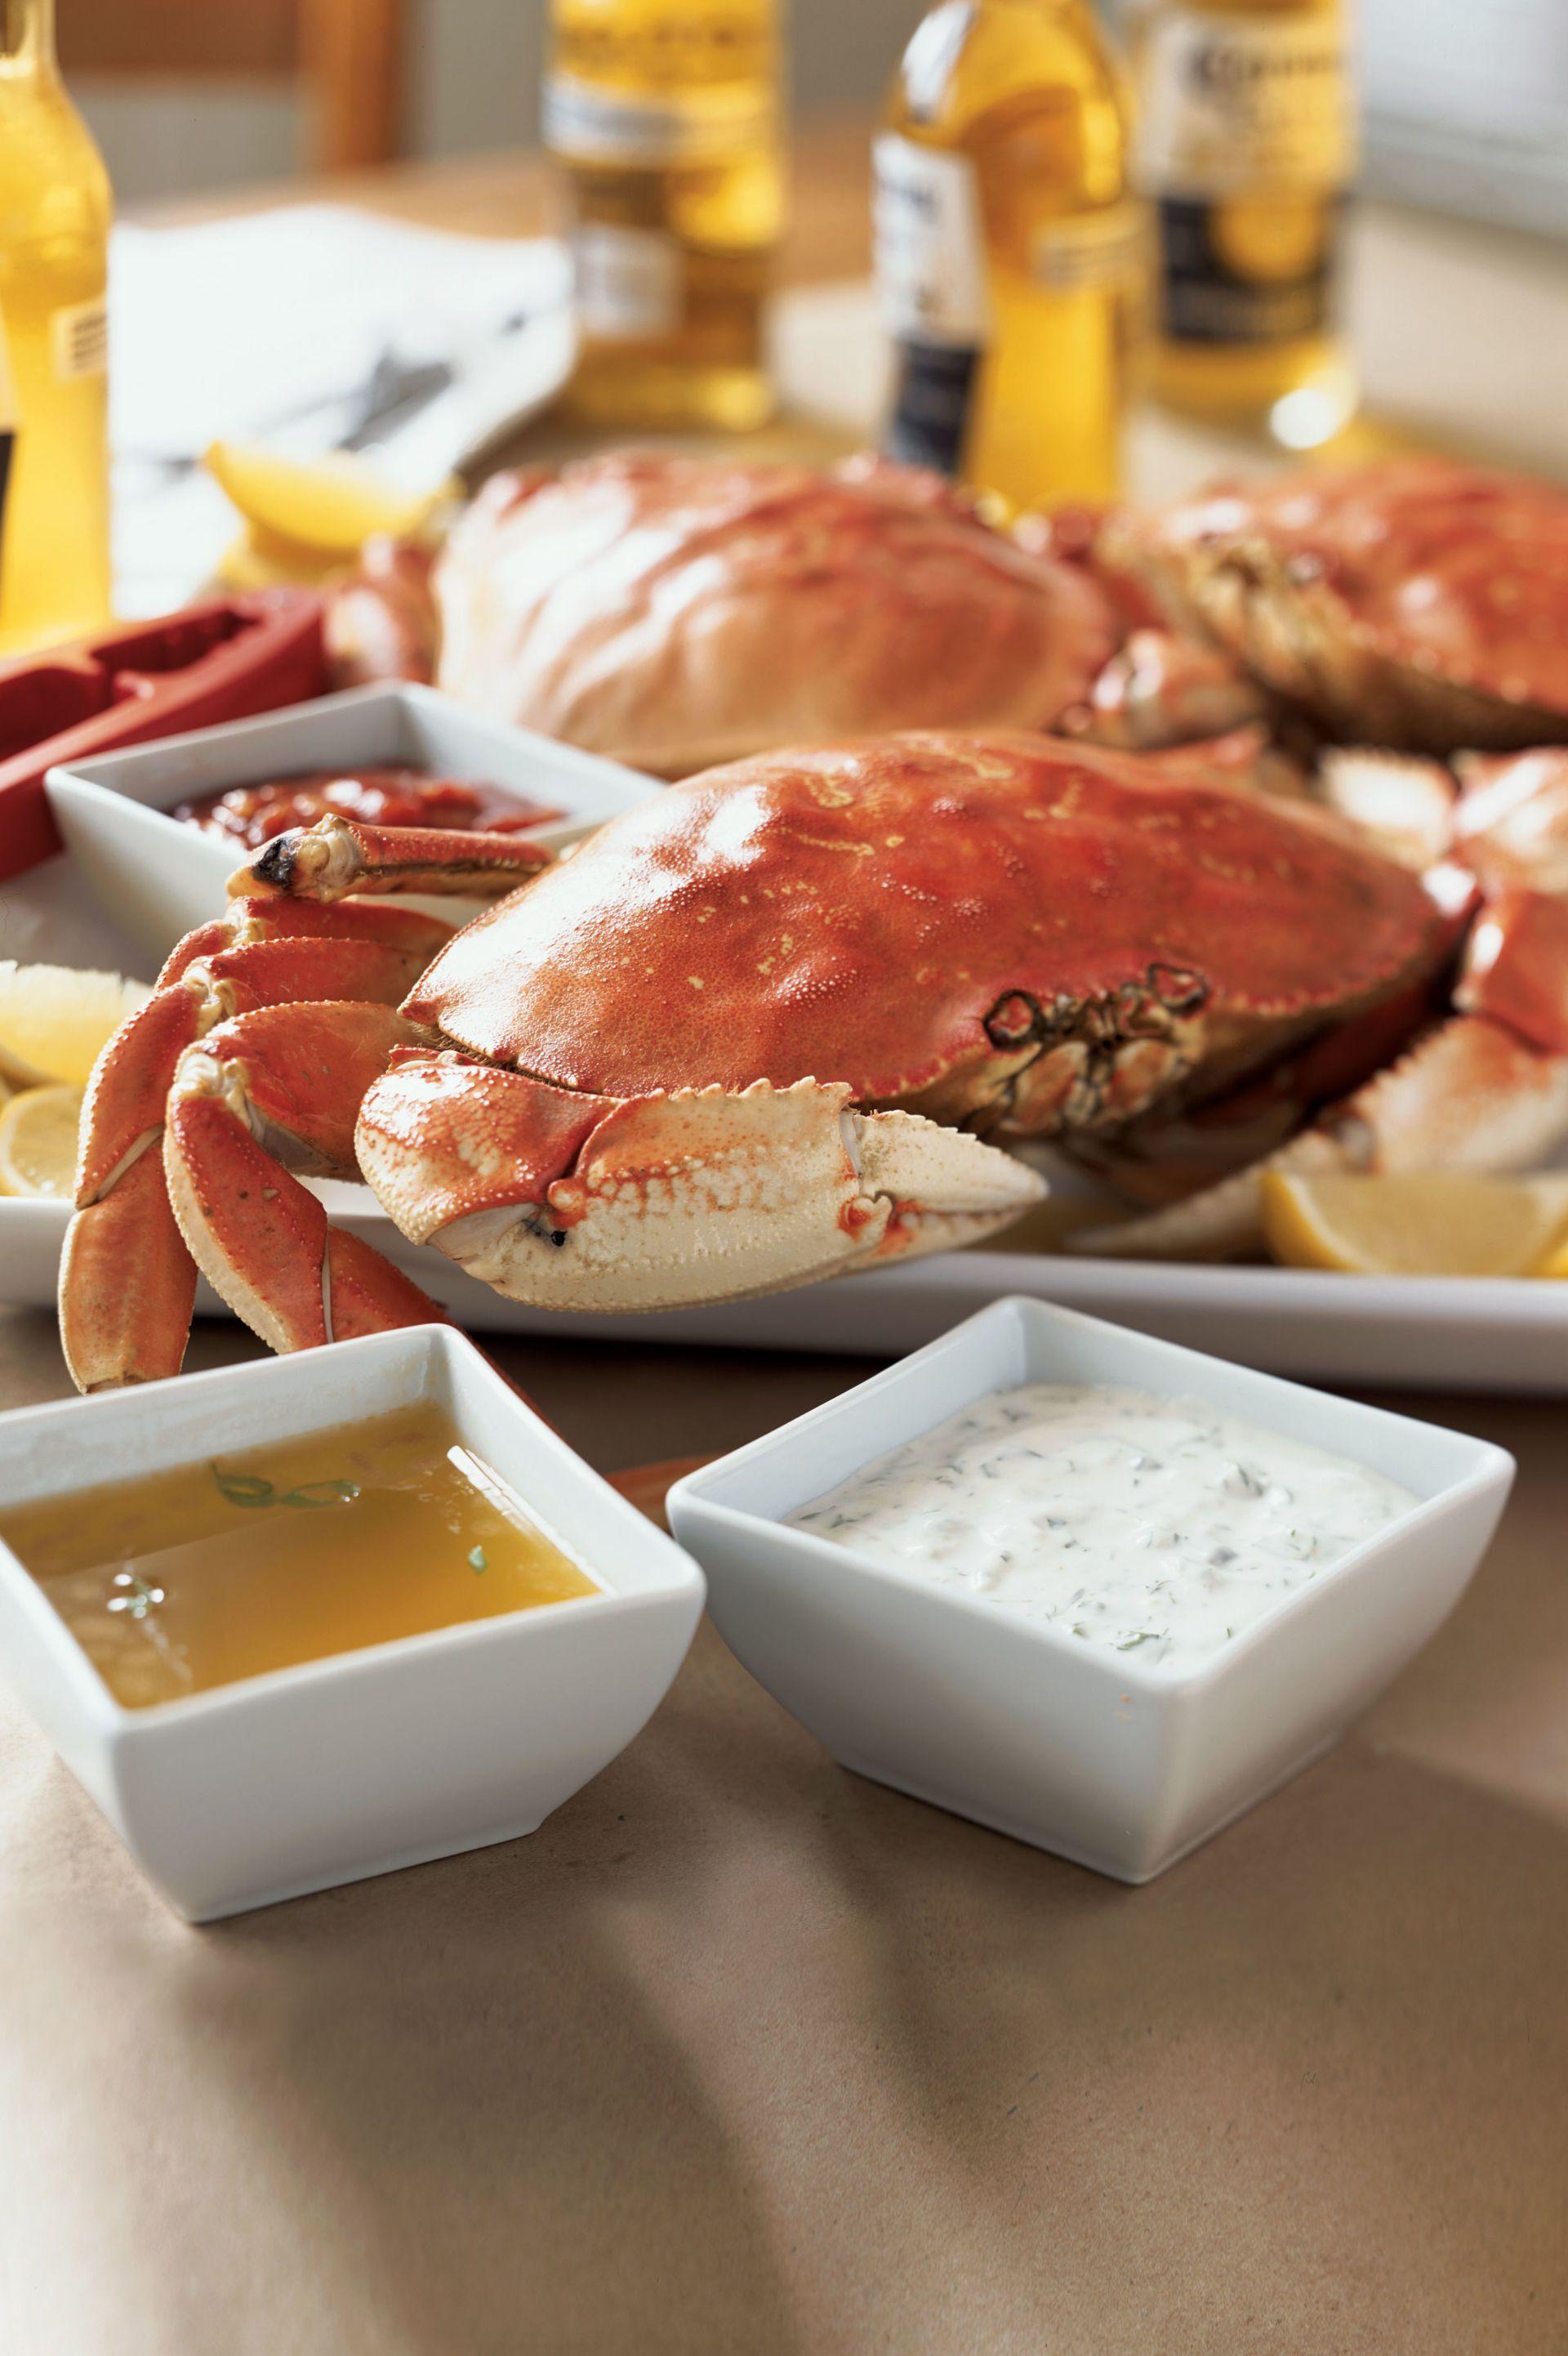 39 Mouth Watering Crab Recipes Crab Recipes Dungeness Crab Recipes Cooking Dungeness Crab